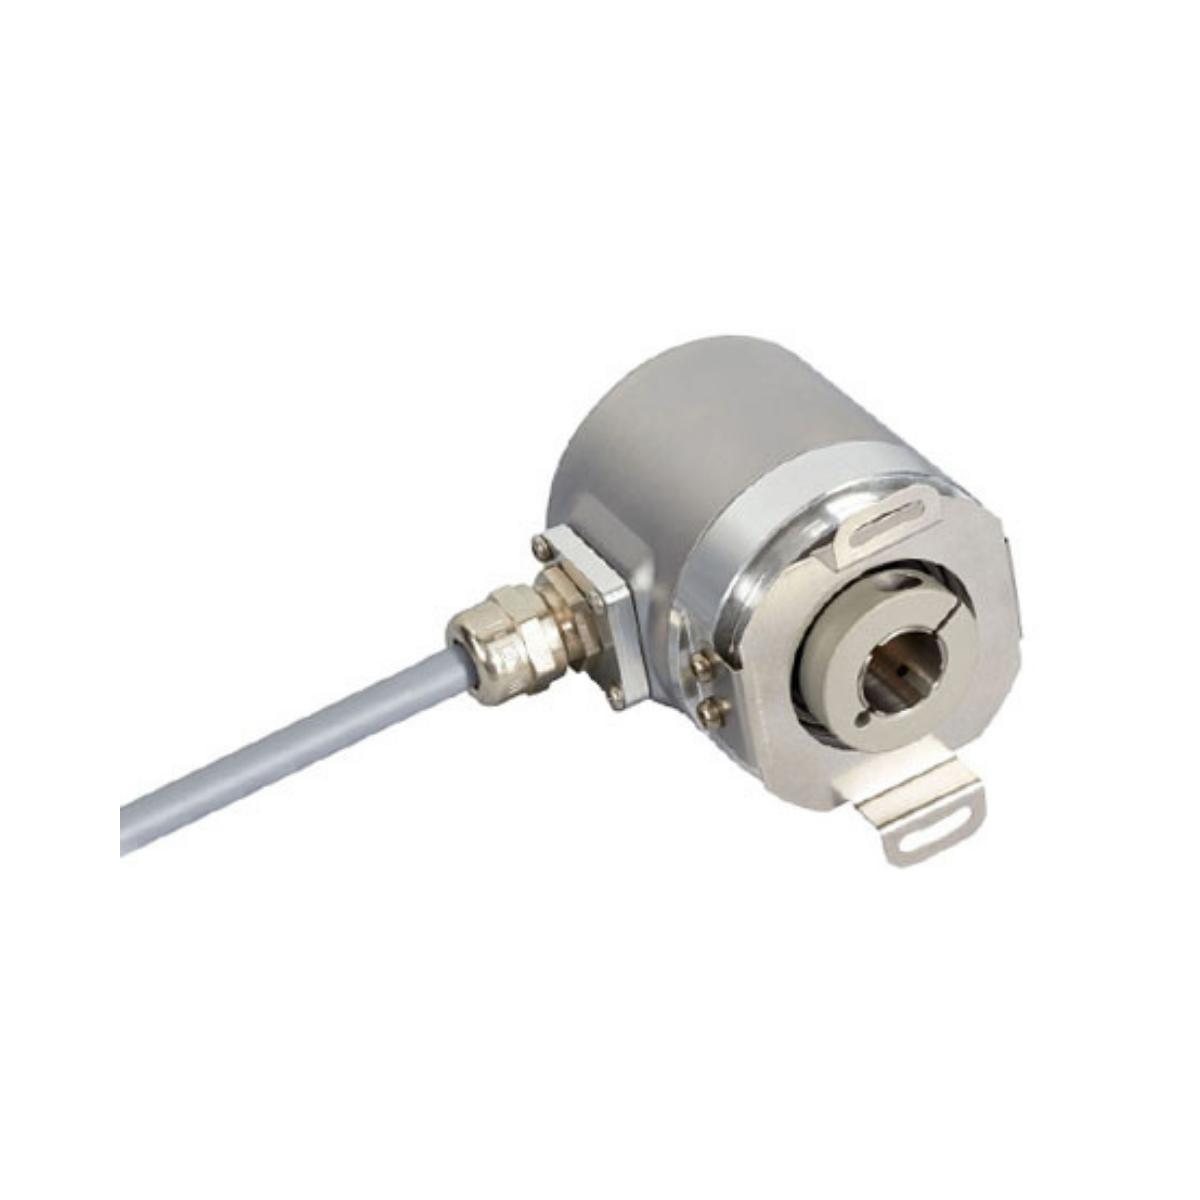 POSITAL UCD-IPH00-01024-HFSS-2RW Blind Hollow Shaft Encoder